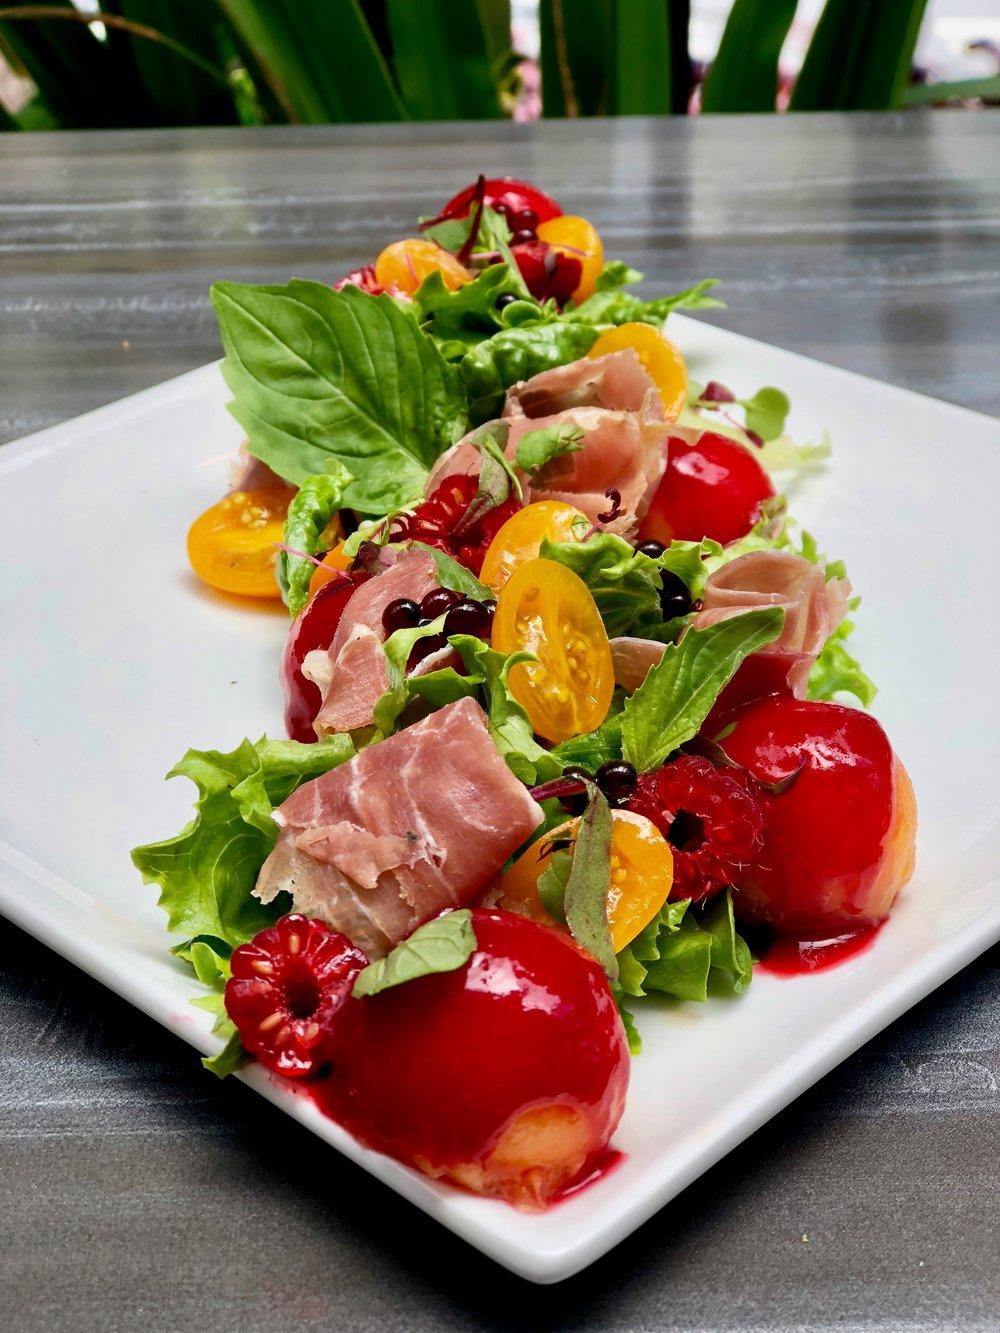 Picasso's Salad